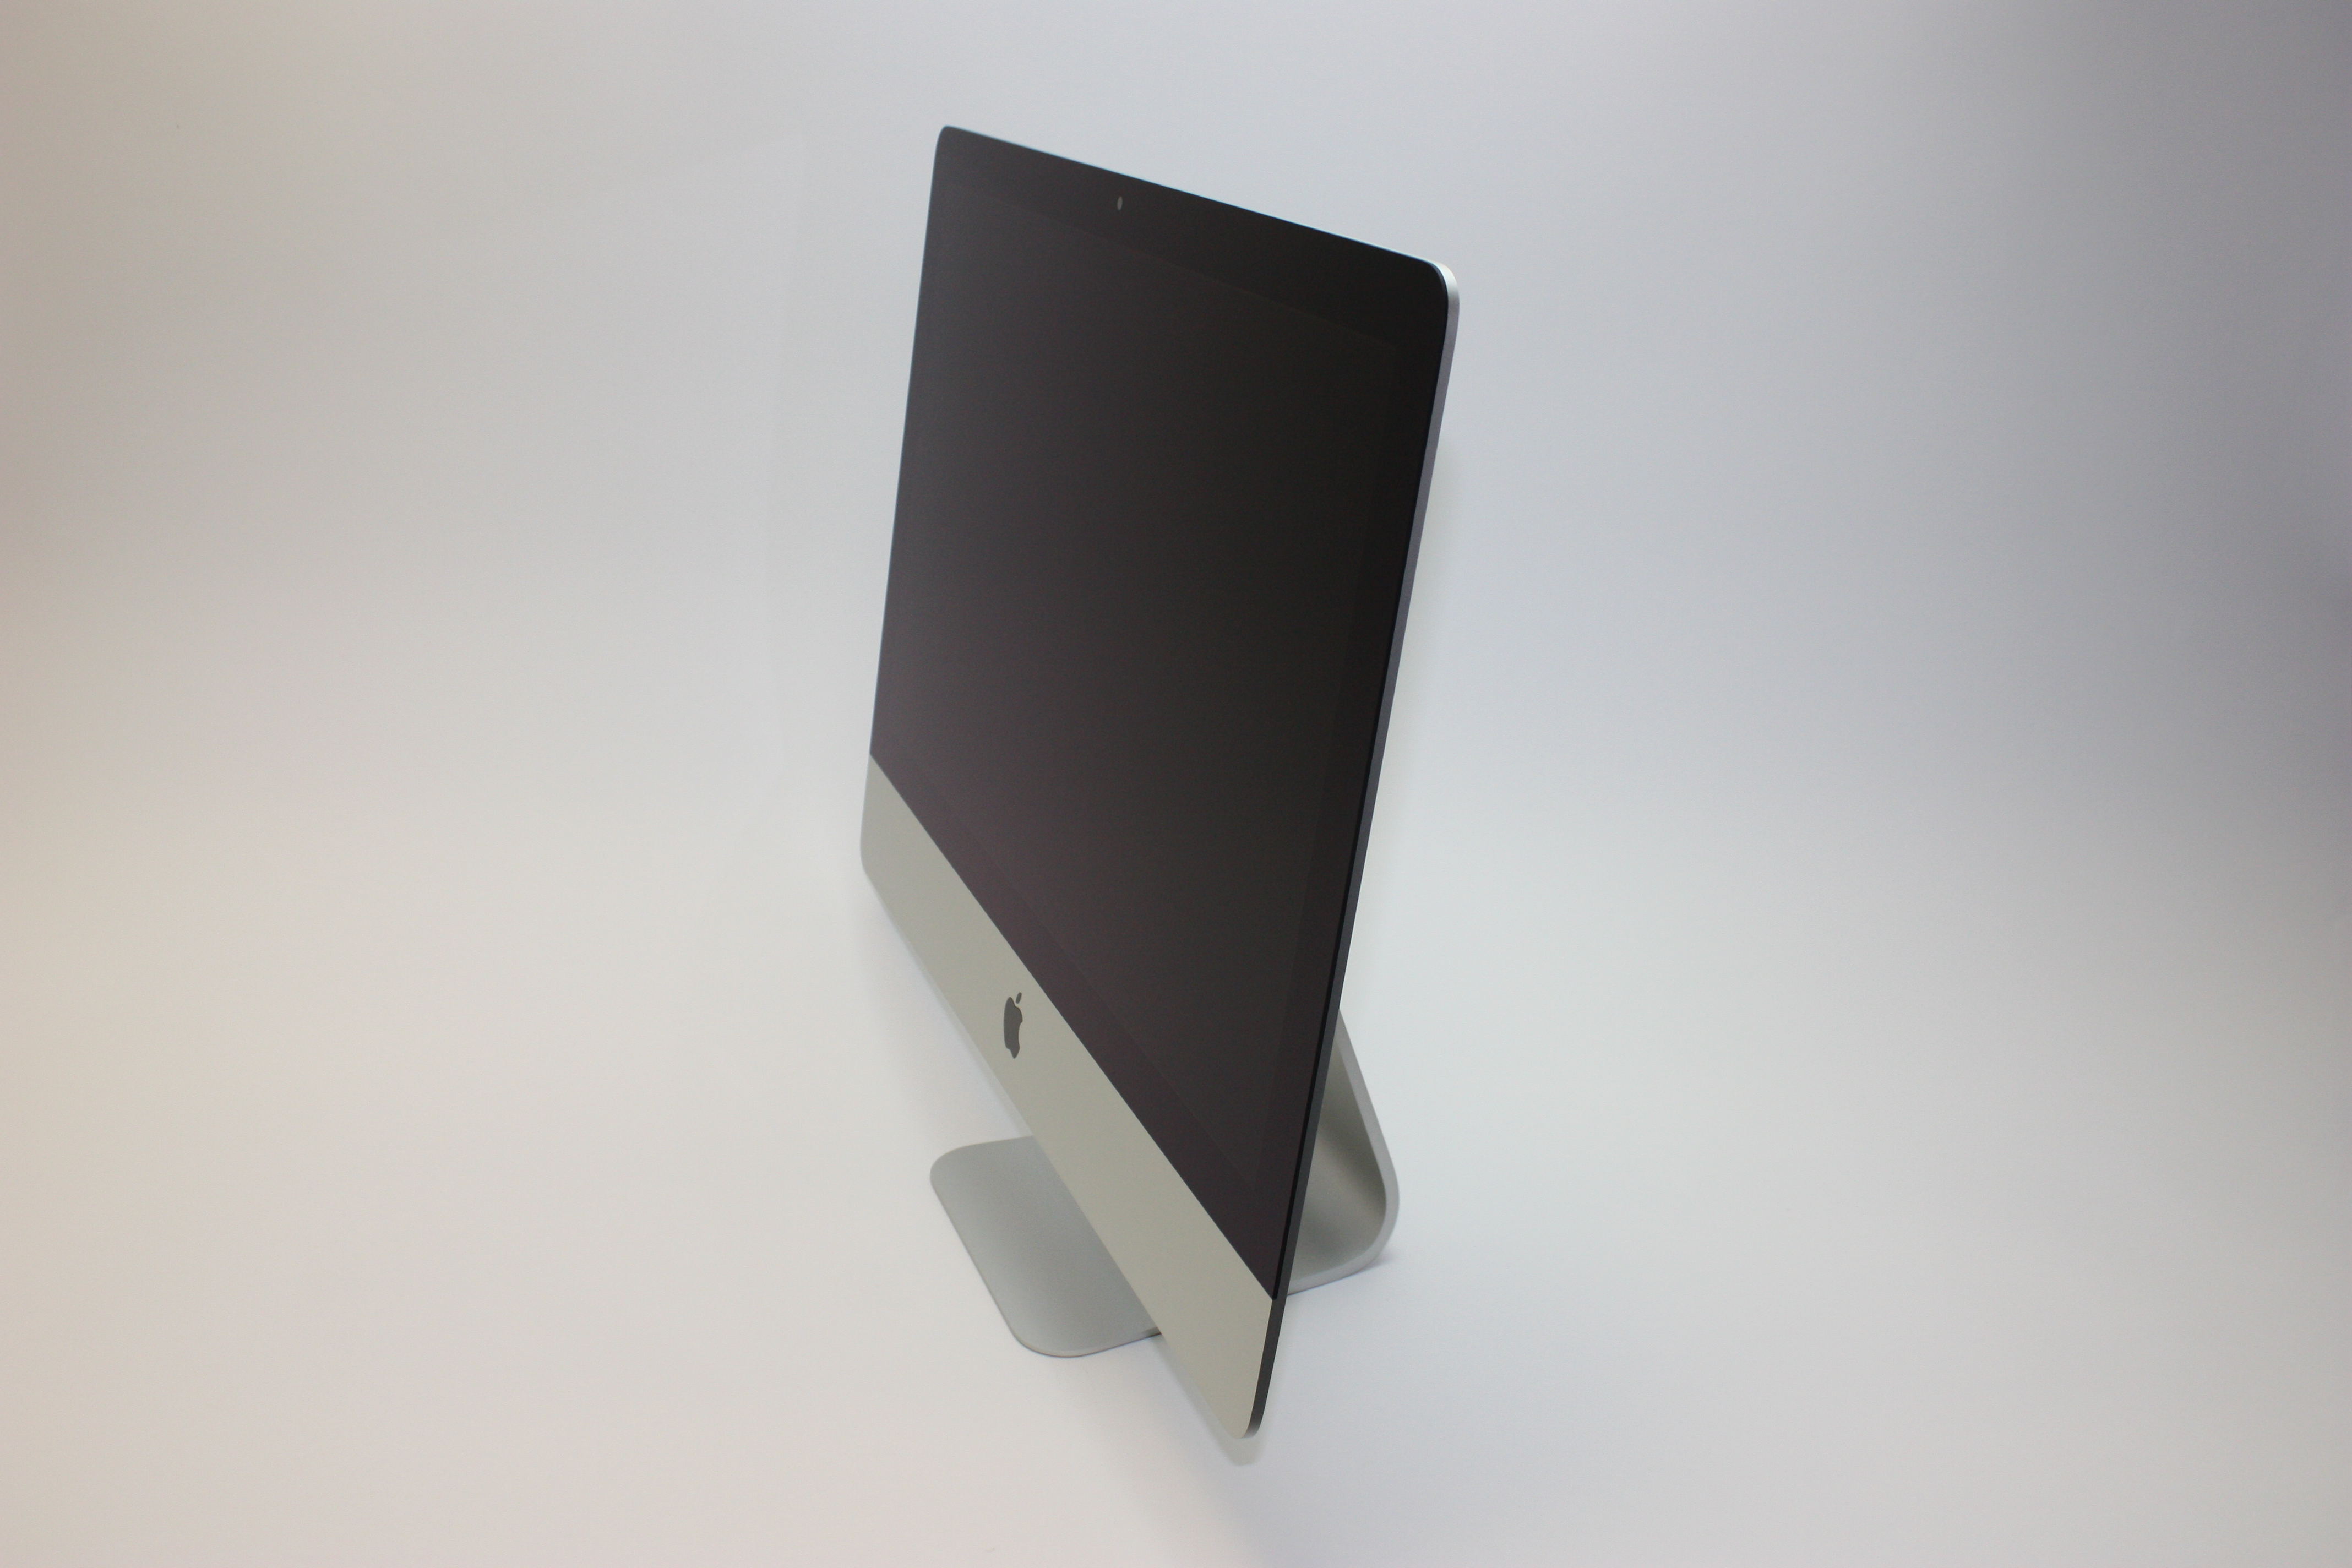 iMac Retina 4K 21.5-inch, 3.0 GHz Core i5, 8 GB 2400 MHz DDR4, 1 TB SATA Disk, image 2